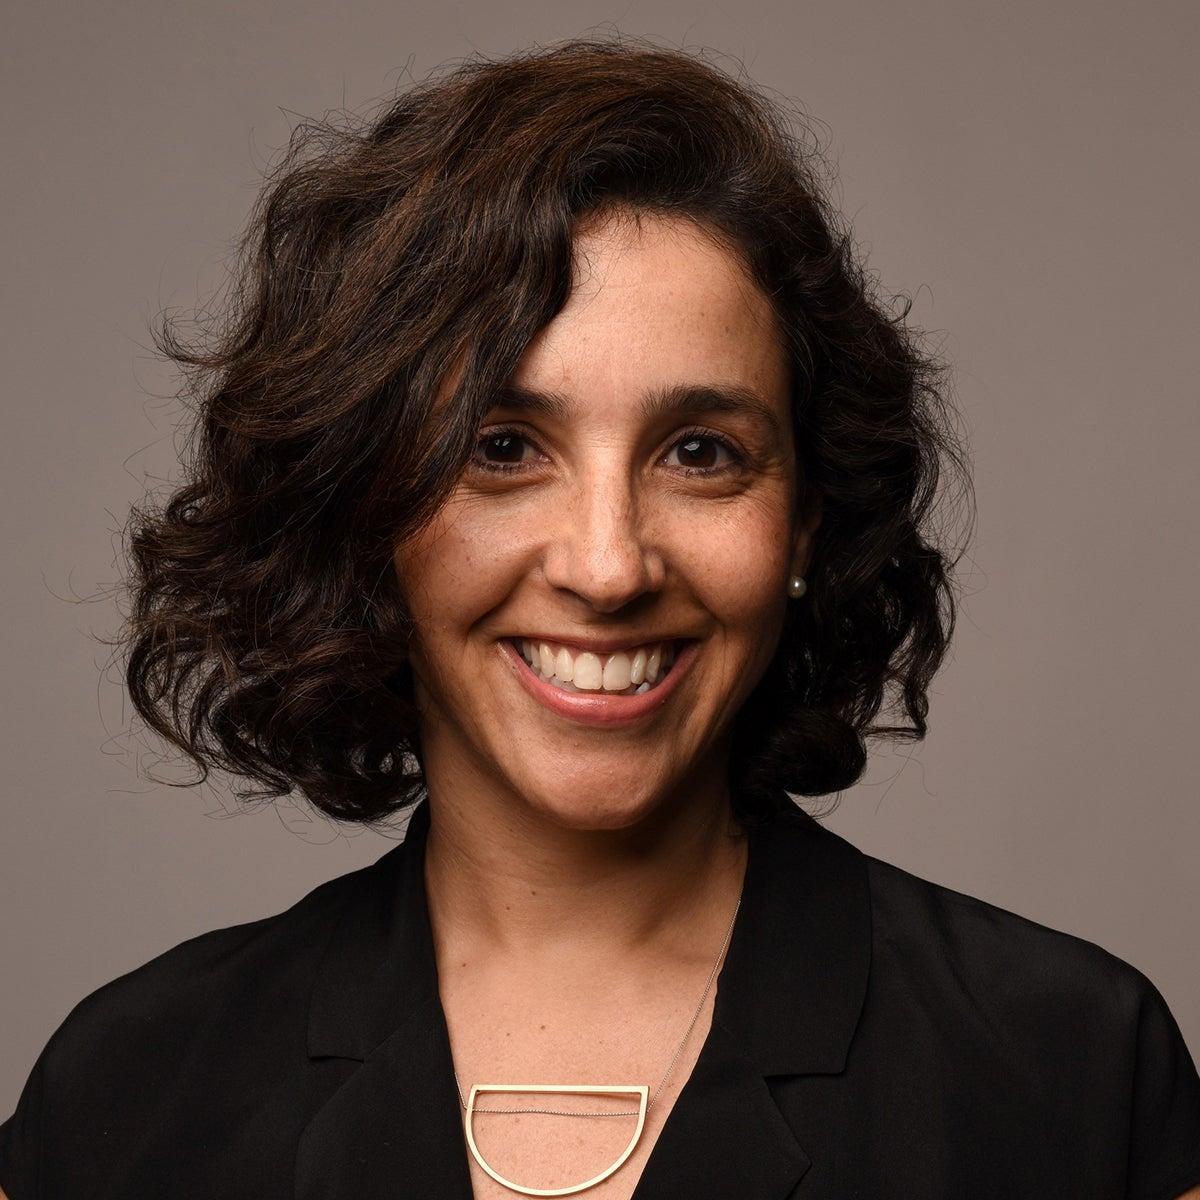 Francisca Rojas